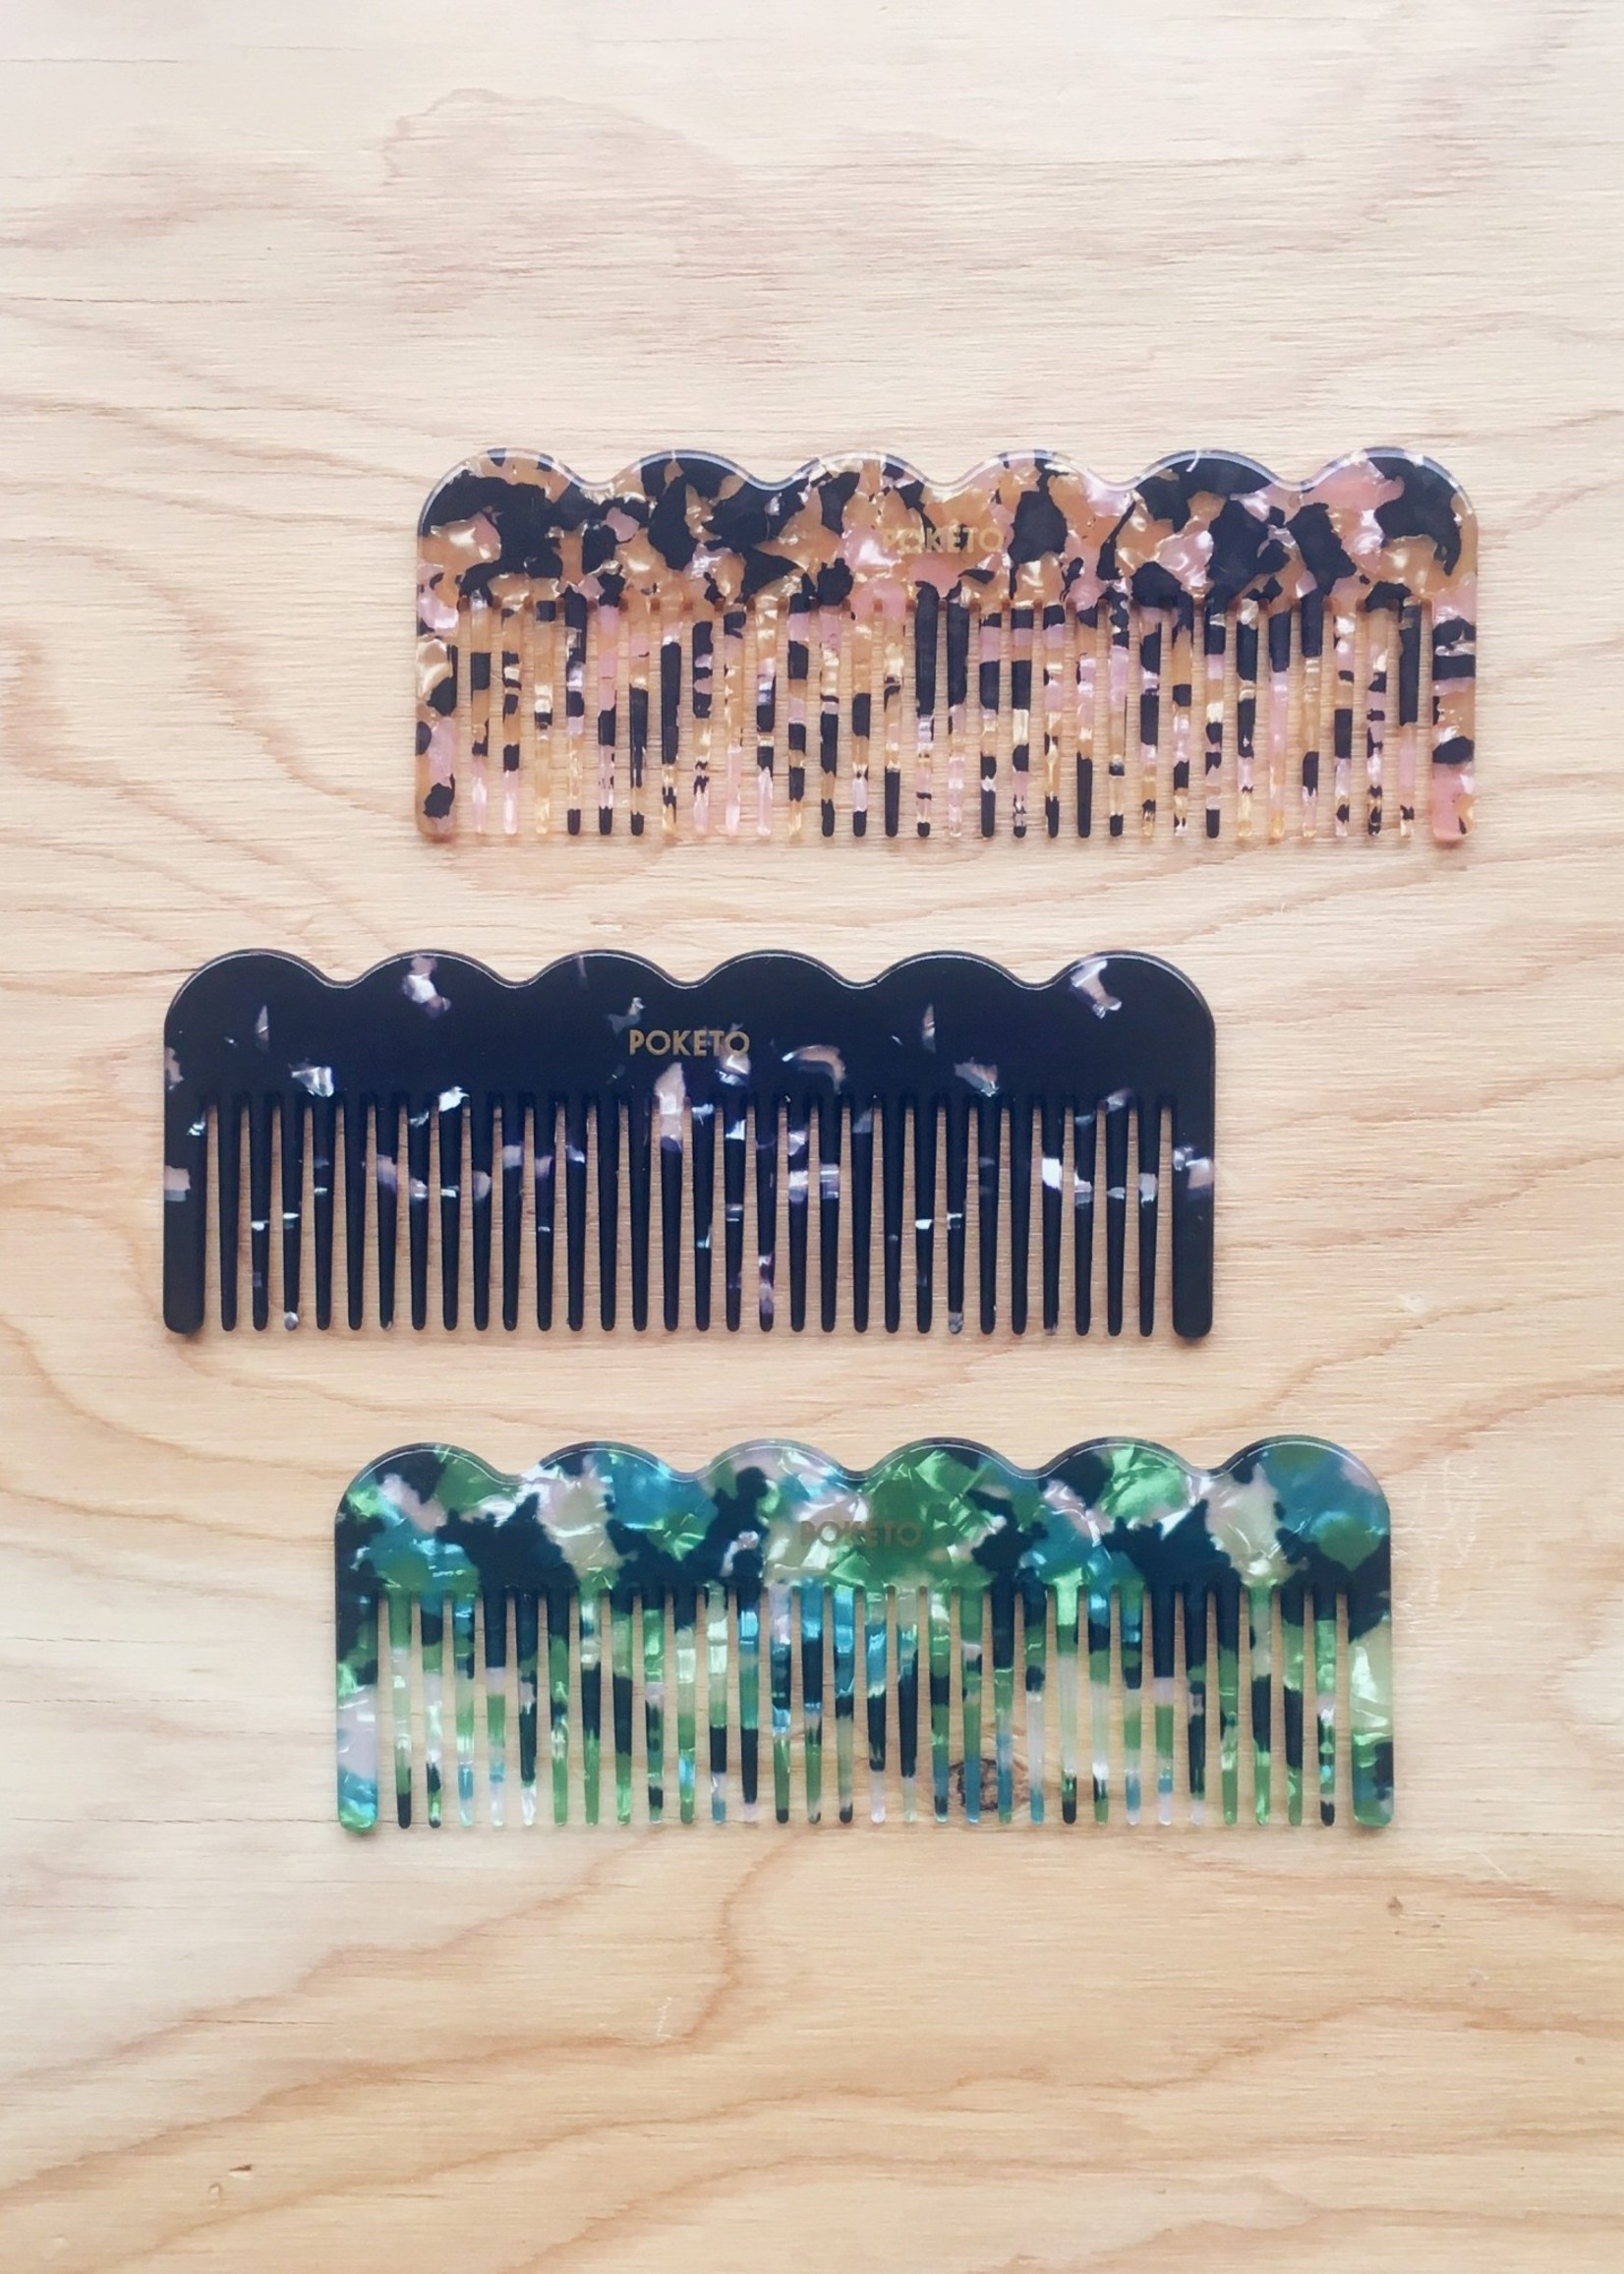 Poketo Wave Combs